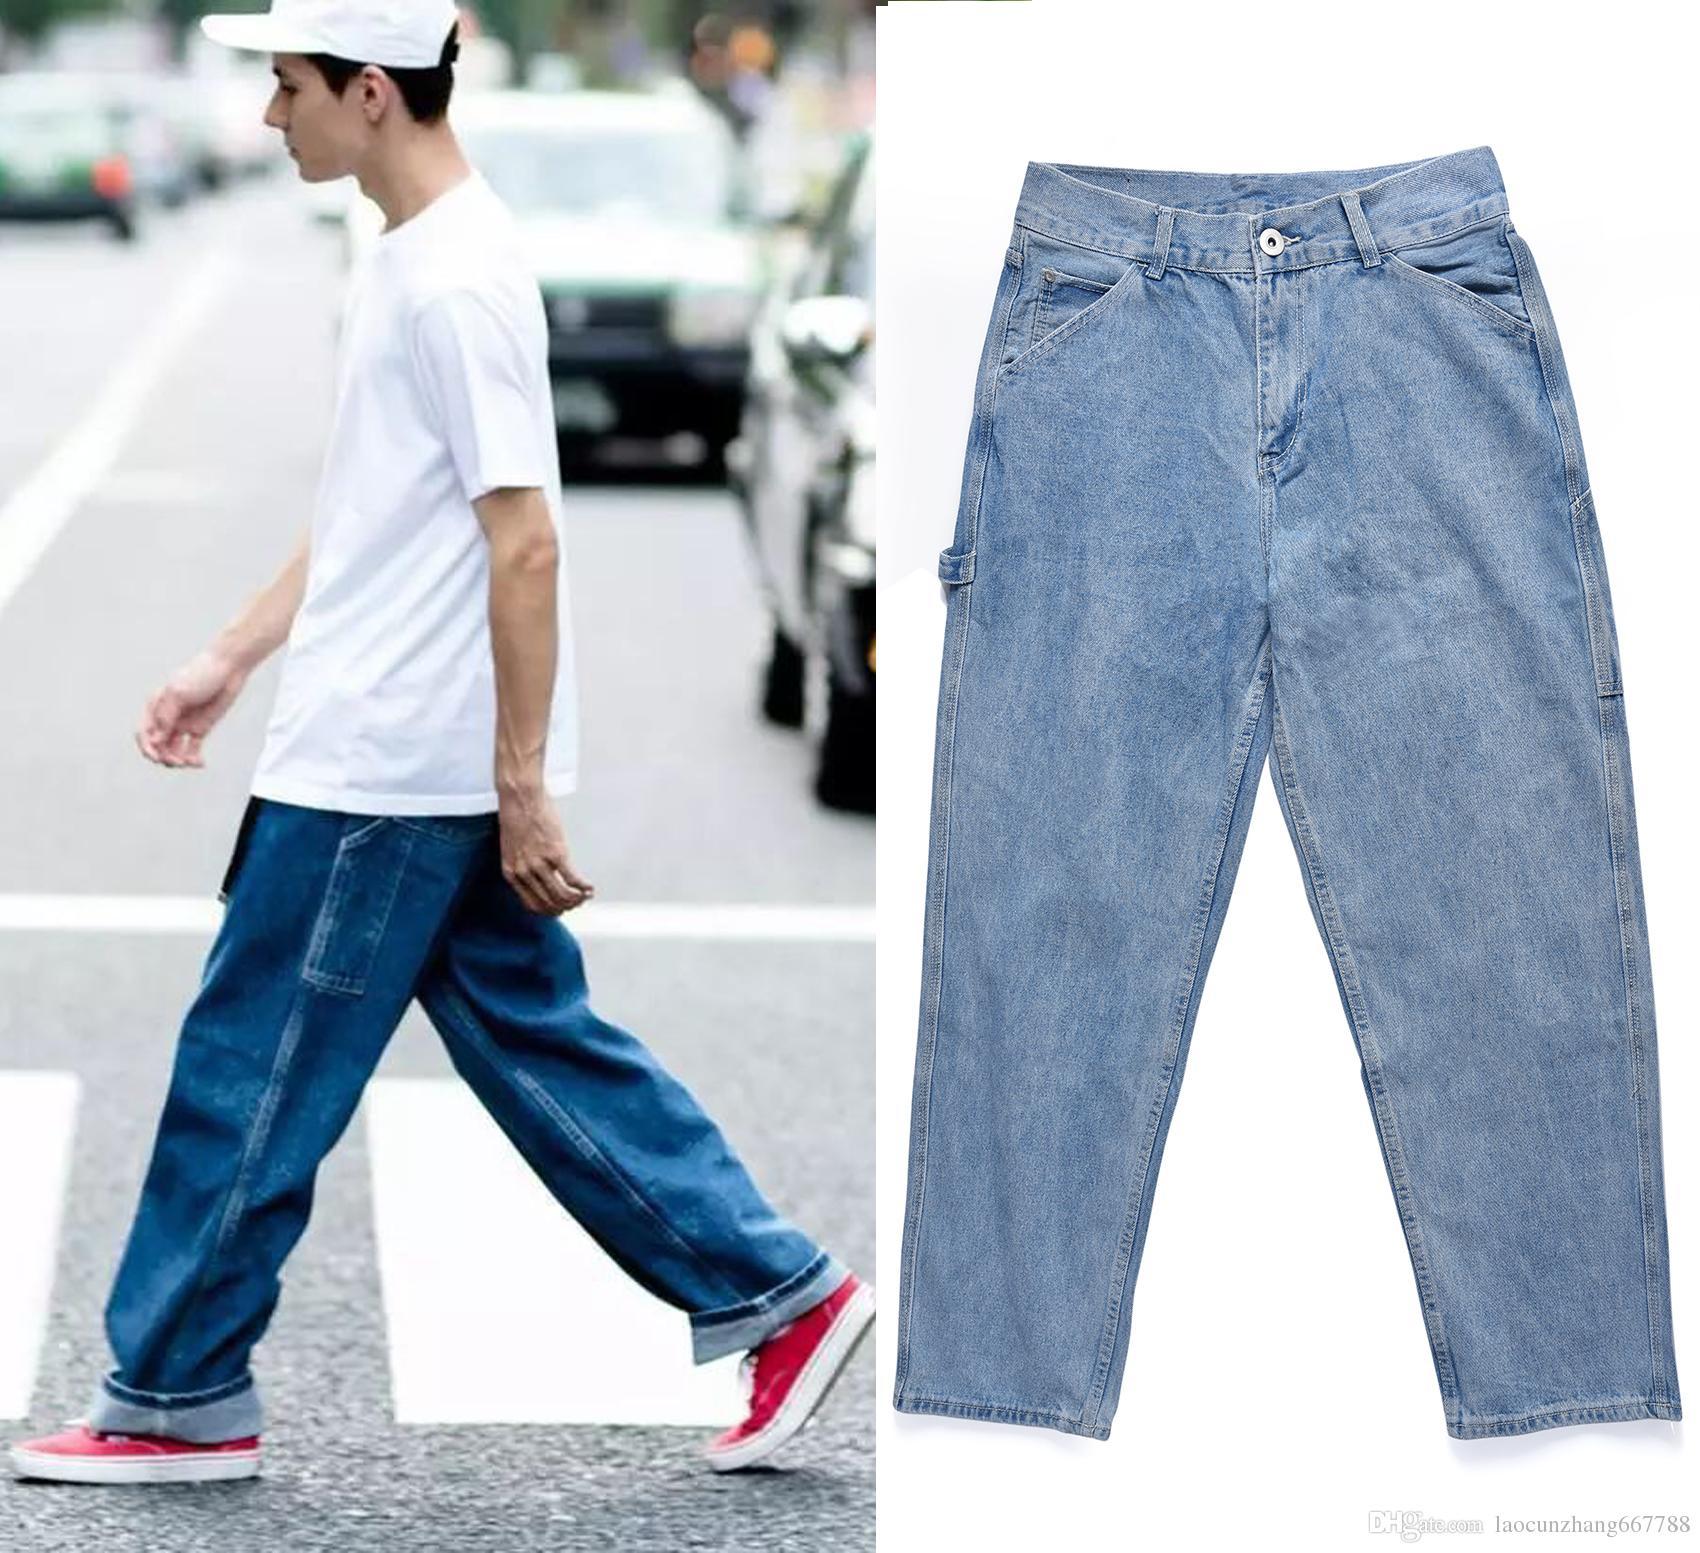 Compre 2018 Mejor Versión RETRO DENIM BLUE Jeans Hombre Baggy Pantalones De  Hipertrofia Hip Hop Casual Streetwear Jeans De Pierna Ancha Talla 30. 32.  34. ab80c676f58